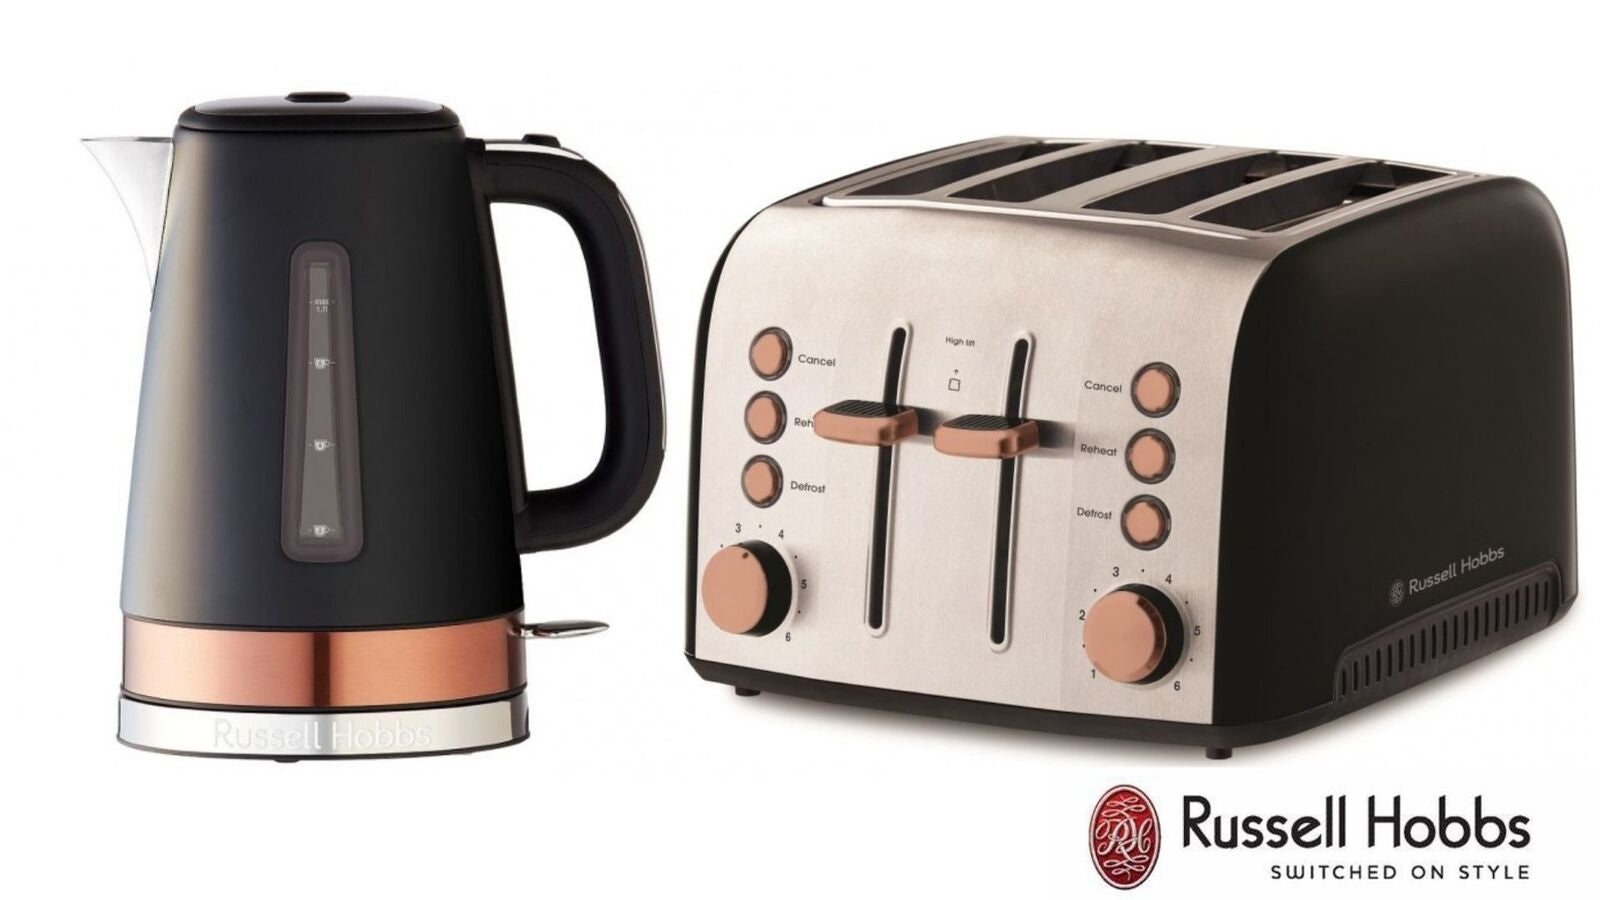 Russell Hobbs Brooklyn 4 Slice Toaster Kettle Set - Black/Copper